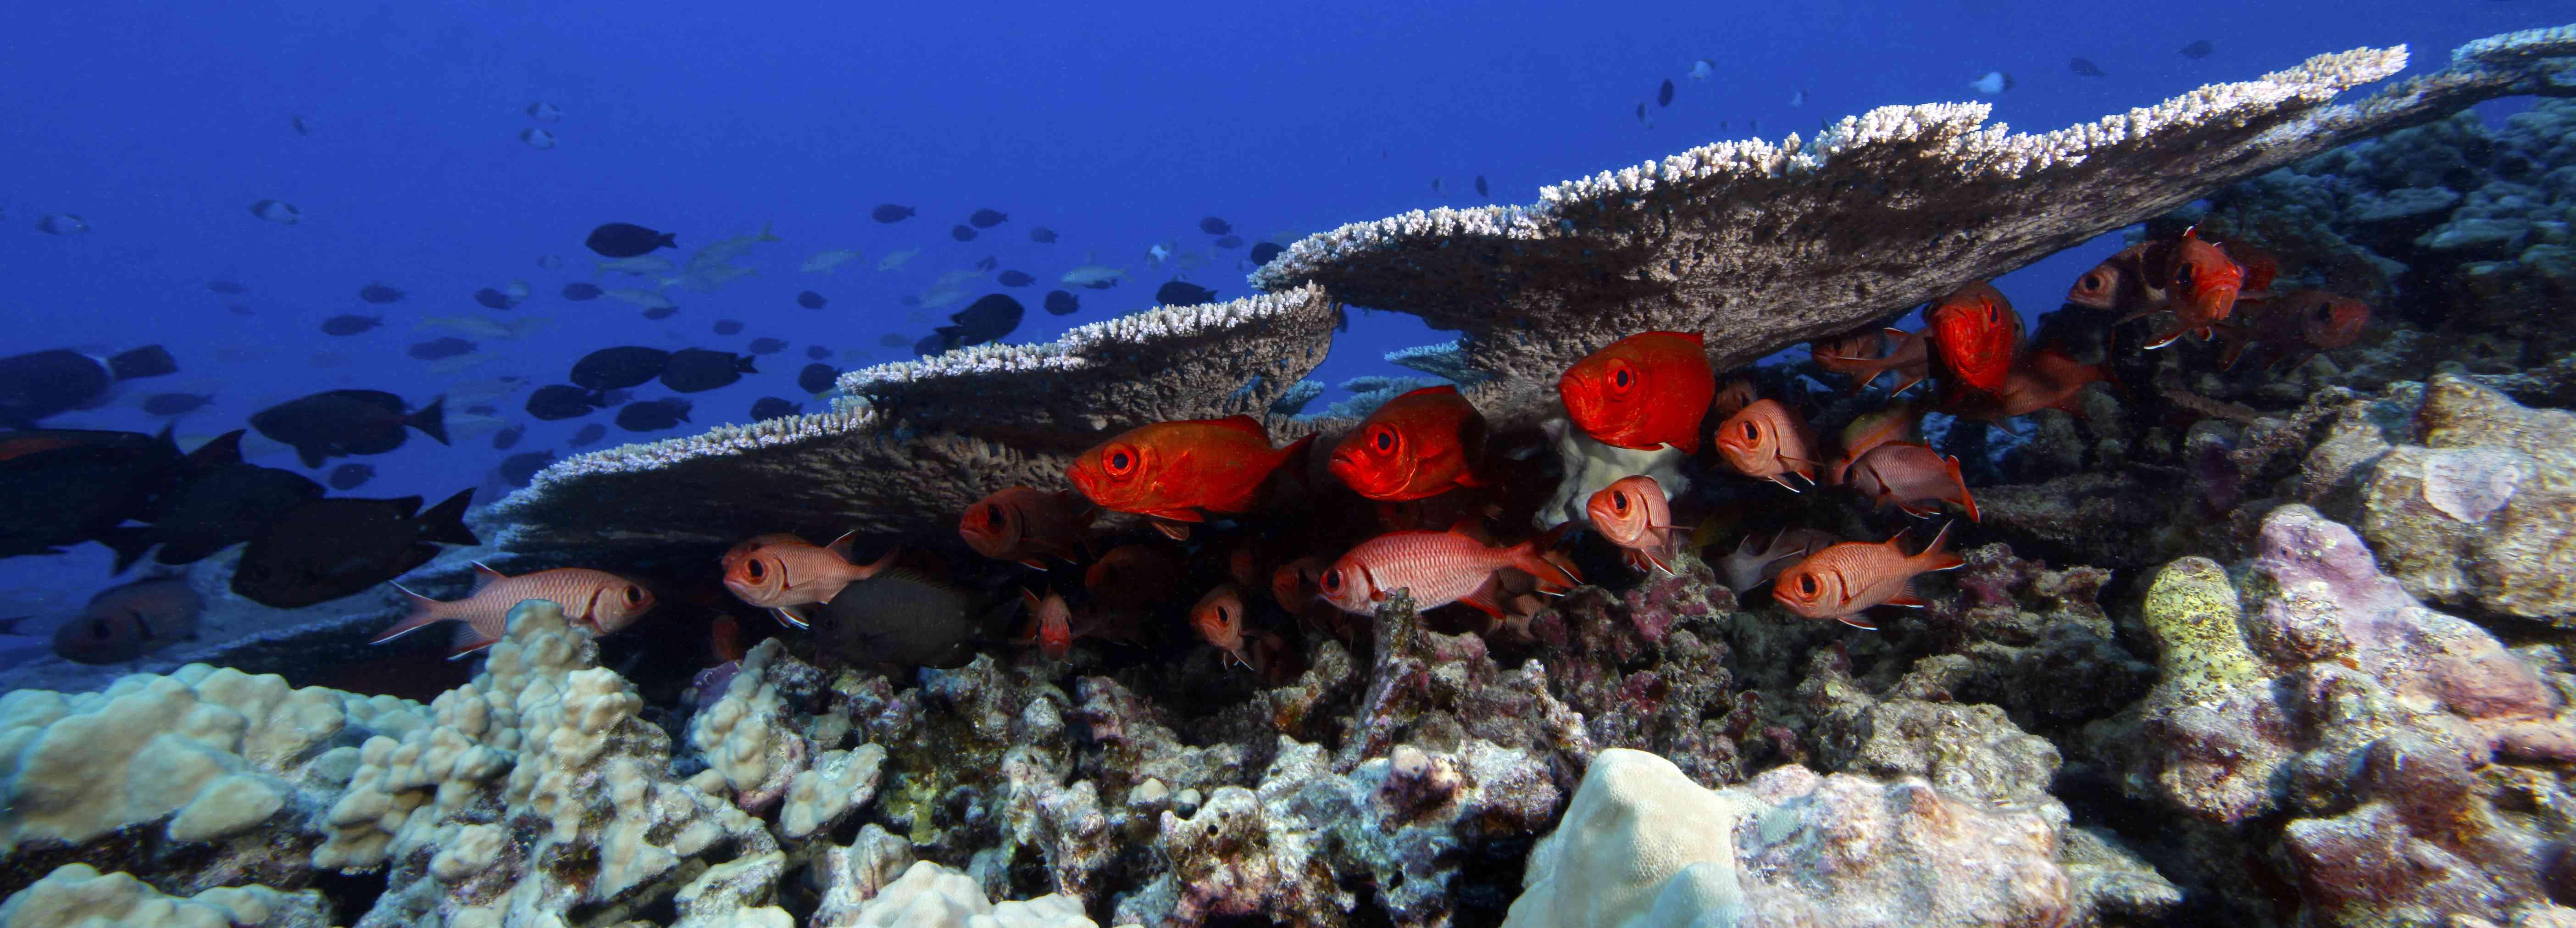 fish in Papahānaumokuākea Marine National Monument